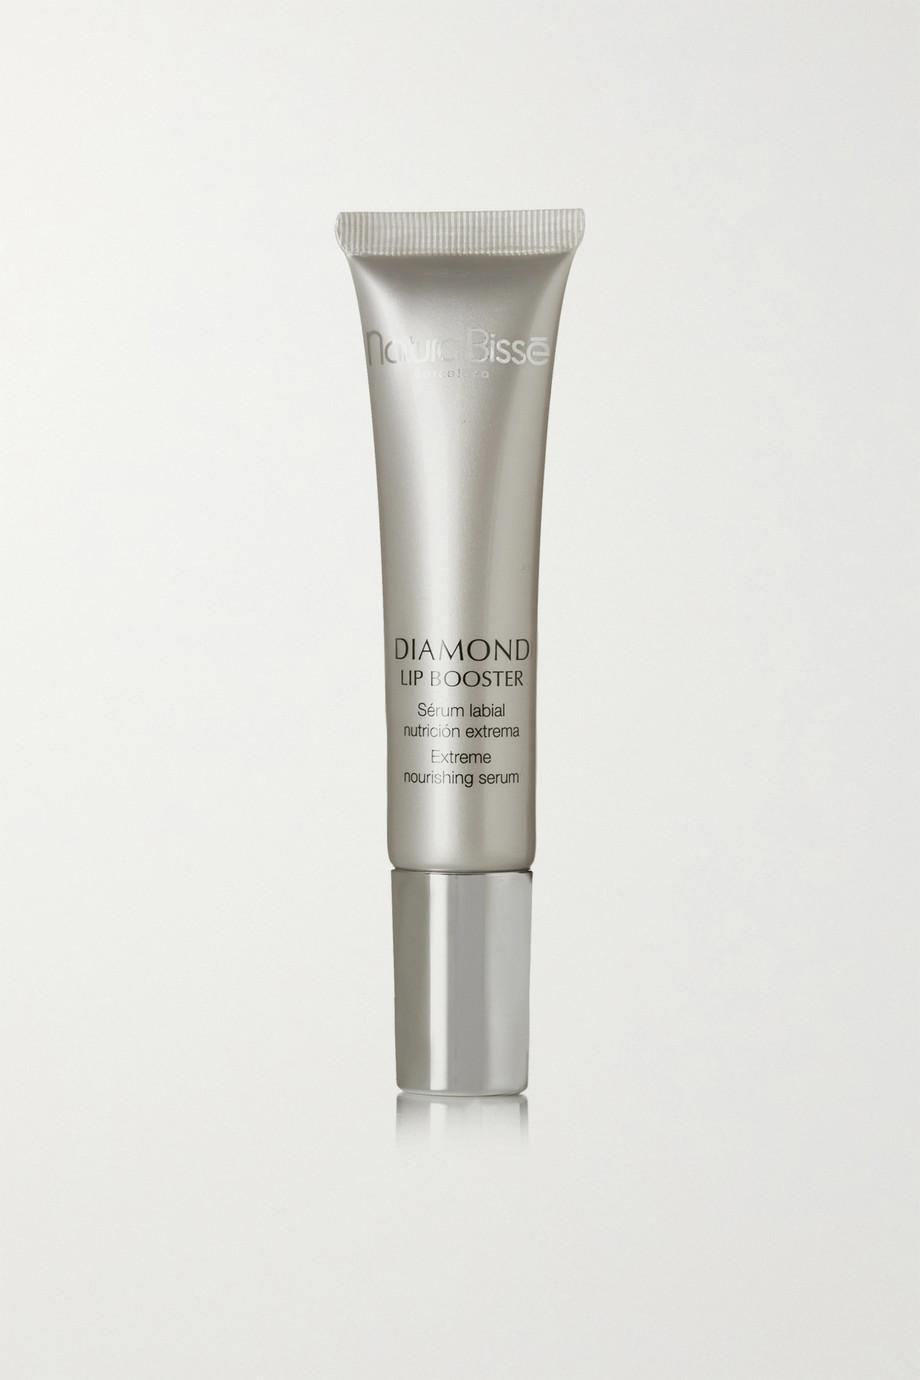 Natura Bissé Diamond Lip Booster, 15ml